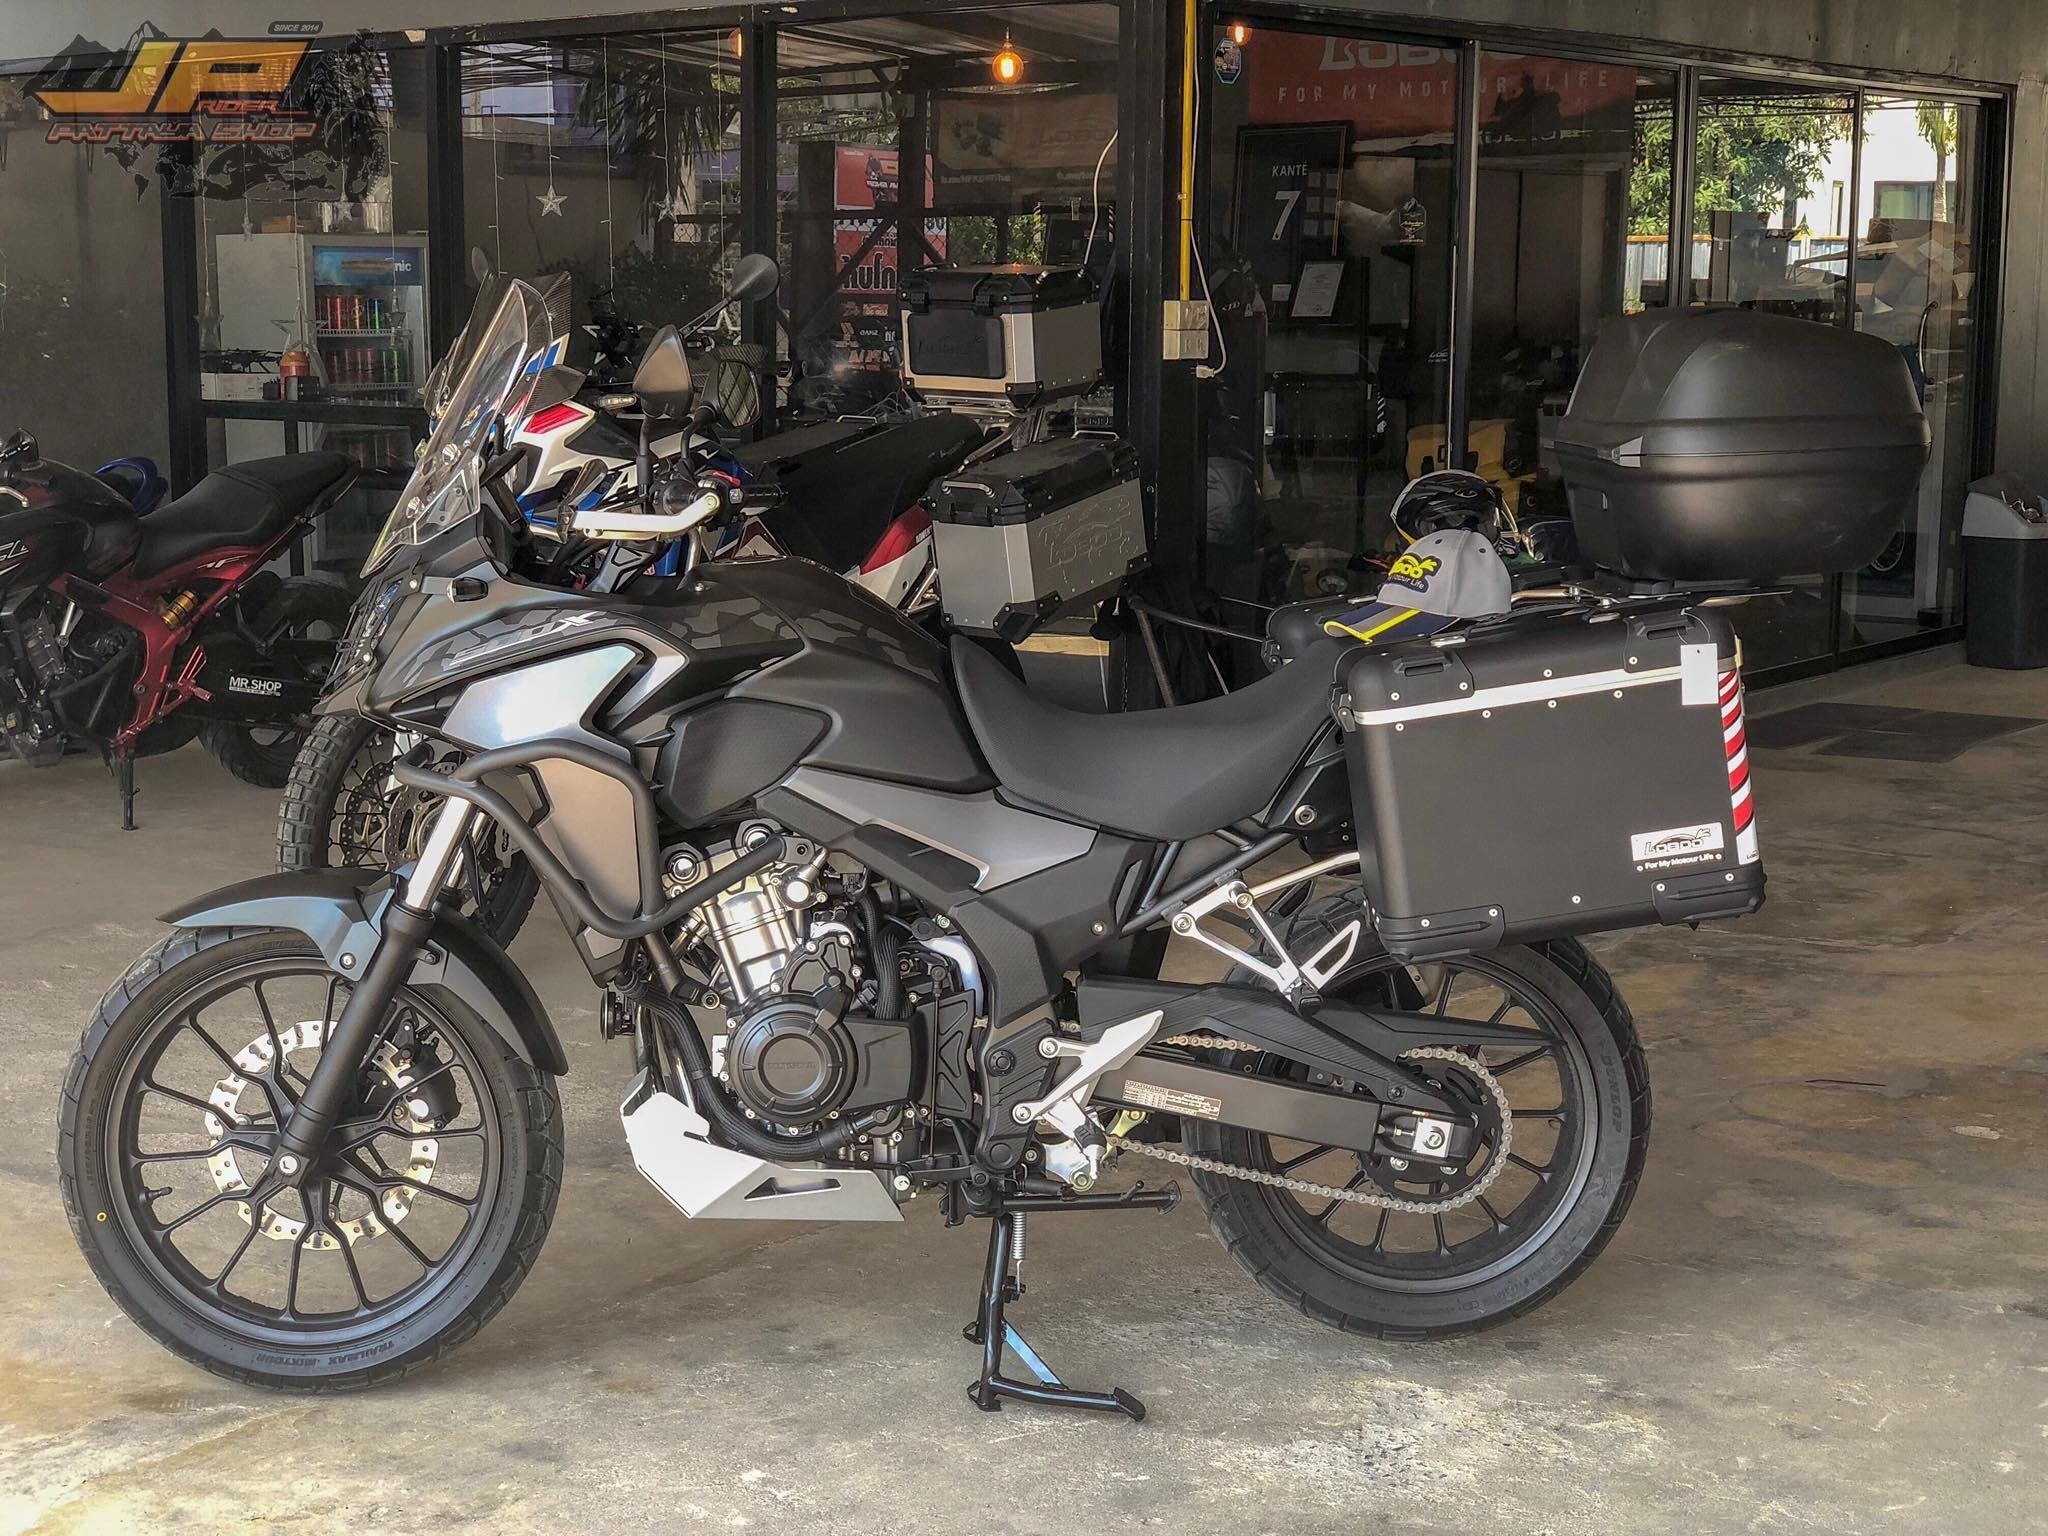 2019 Honda Cb500x Strona 7 Jeździec Przygody Honda Cb 500 Honda Cb Cool Bikes